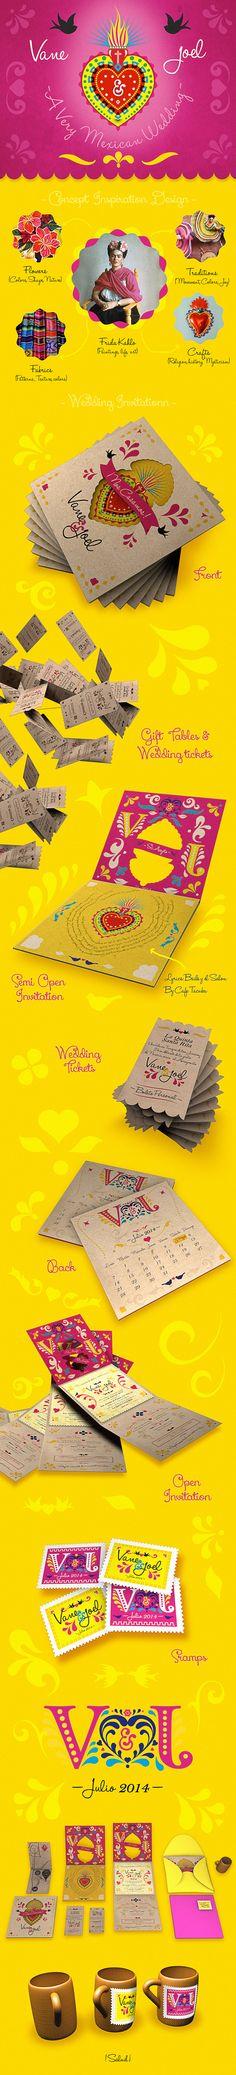 Mexican Wedding Invitation by EÑE Diseño #wedding #mexican #boda #mexicana…